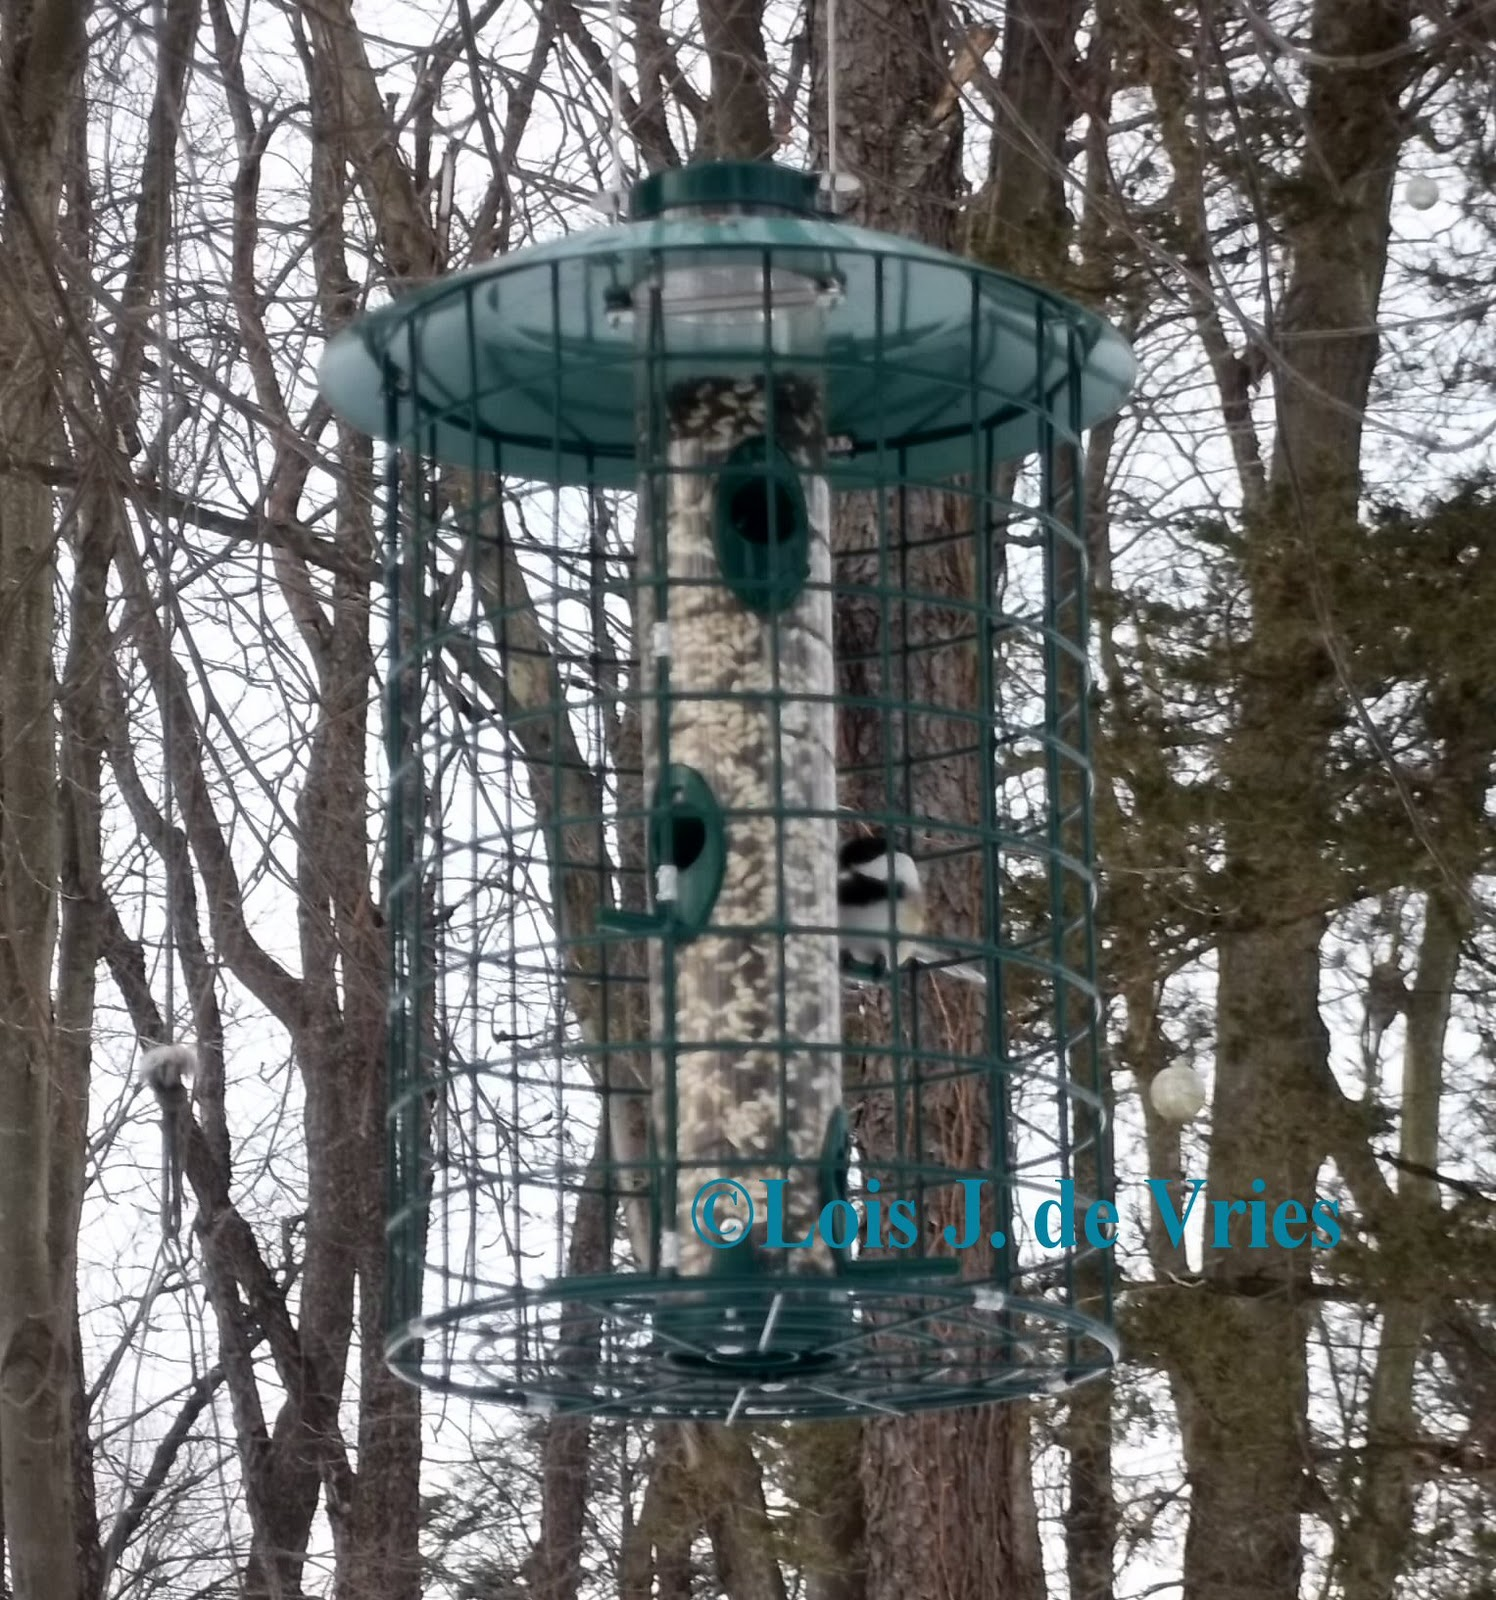 Squirrel-Proof Bird Feeder Idea